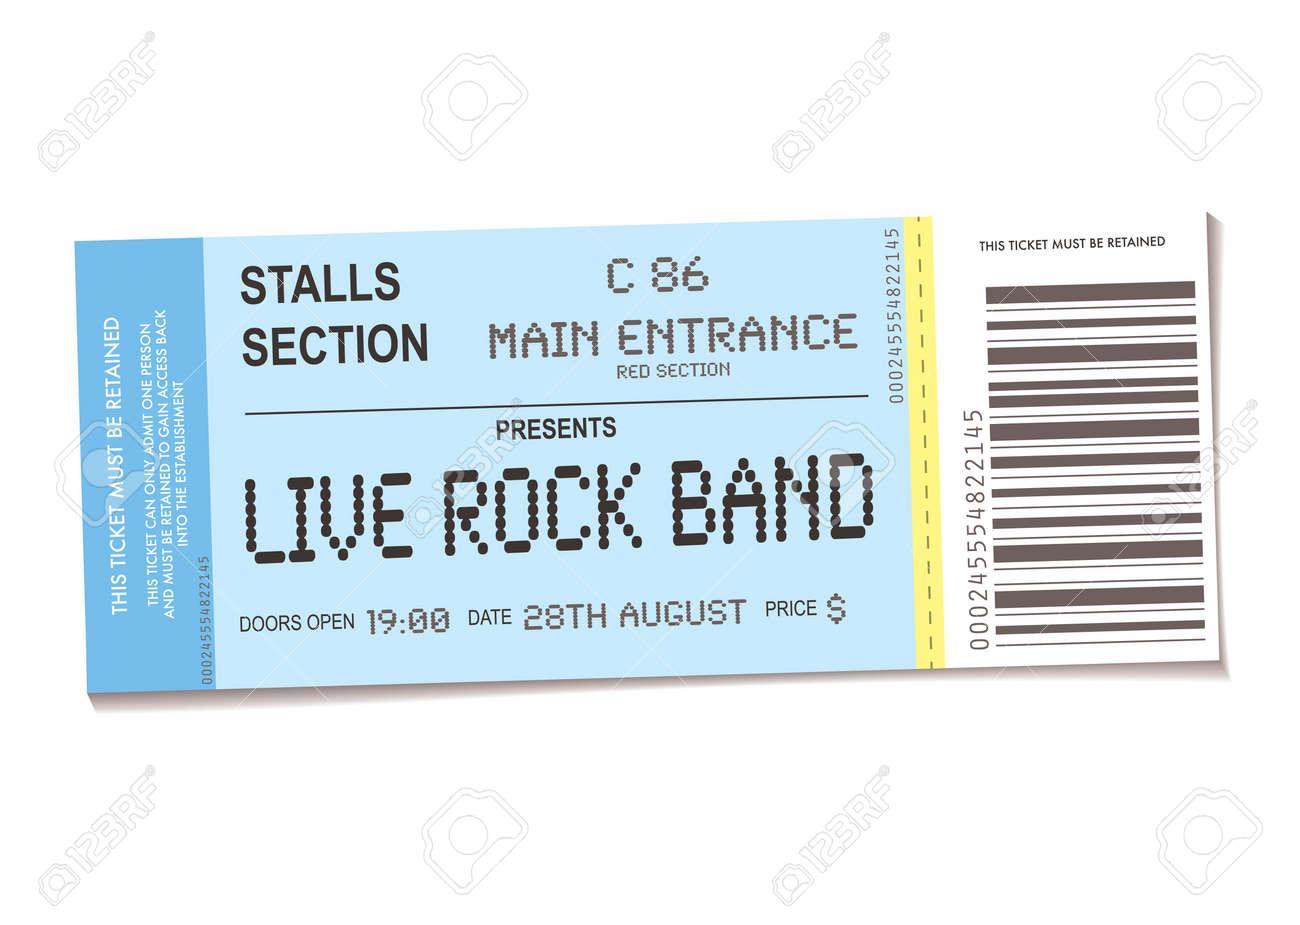 concert ticket template free printable – Concert Ticket Template Free